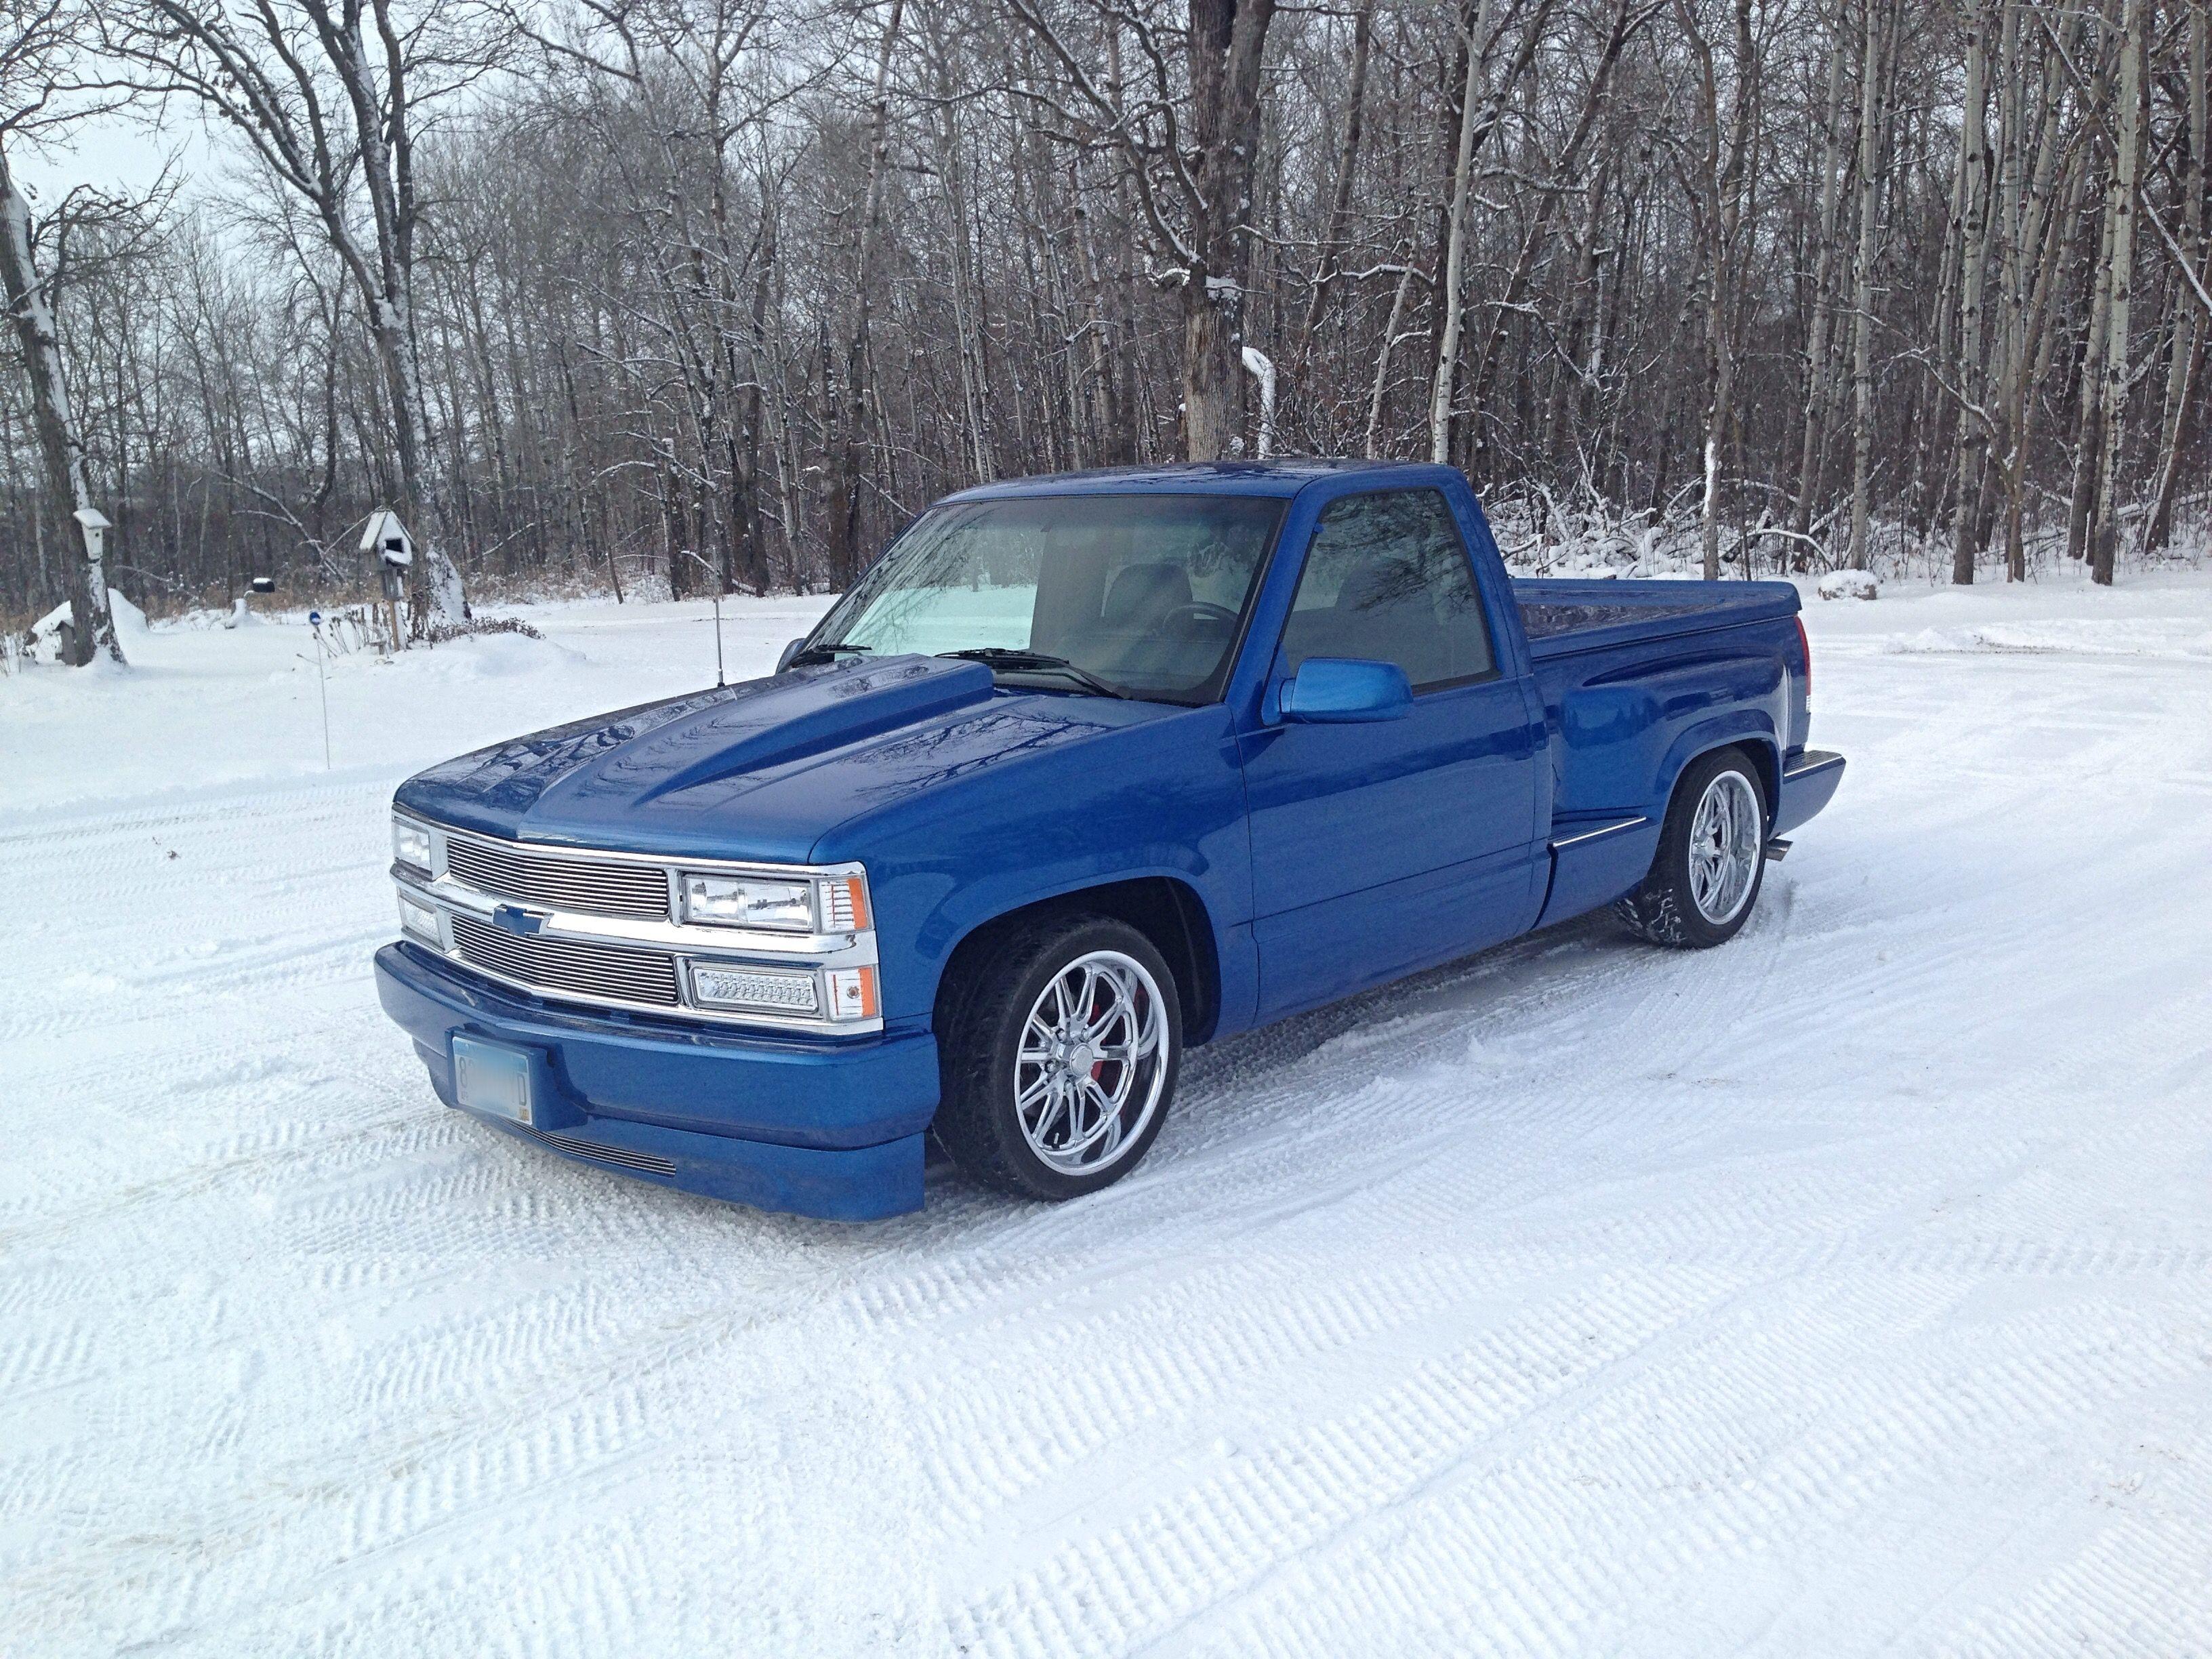 1992 chevrolet stepside chevy stepside chevy silverado 1500 chevy pickups hot rod trucks [ 3264 x 2448 Pixel ]